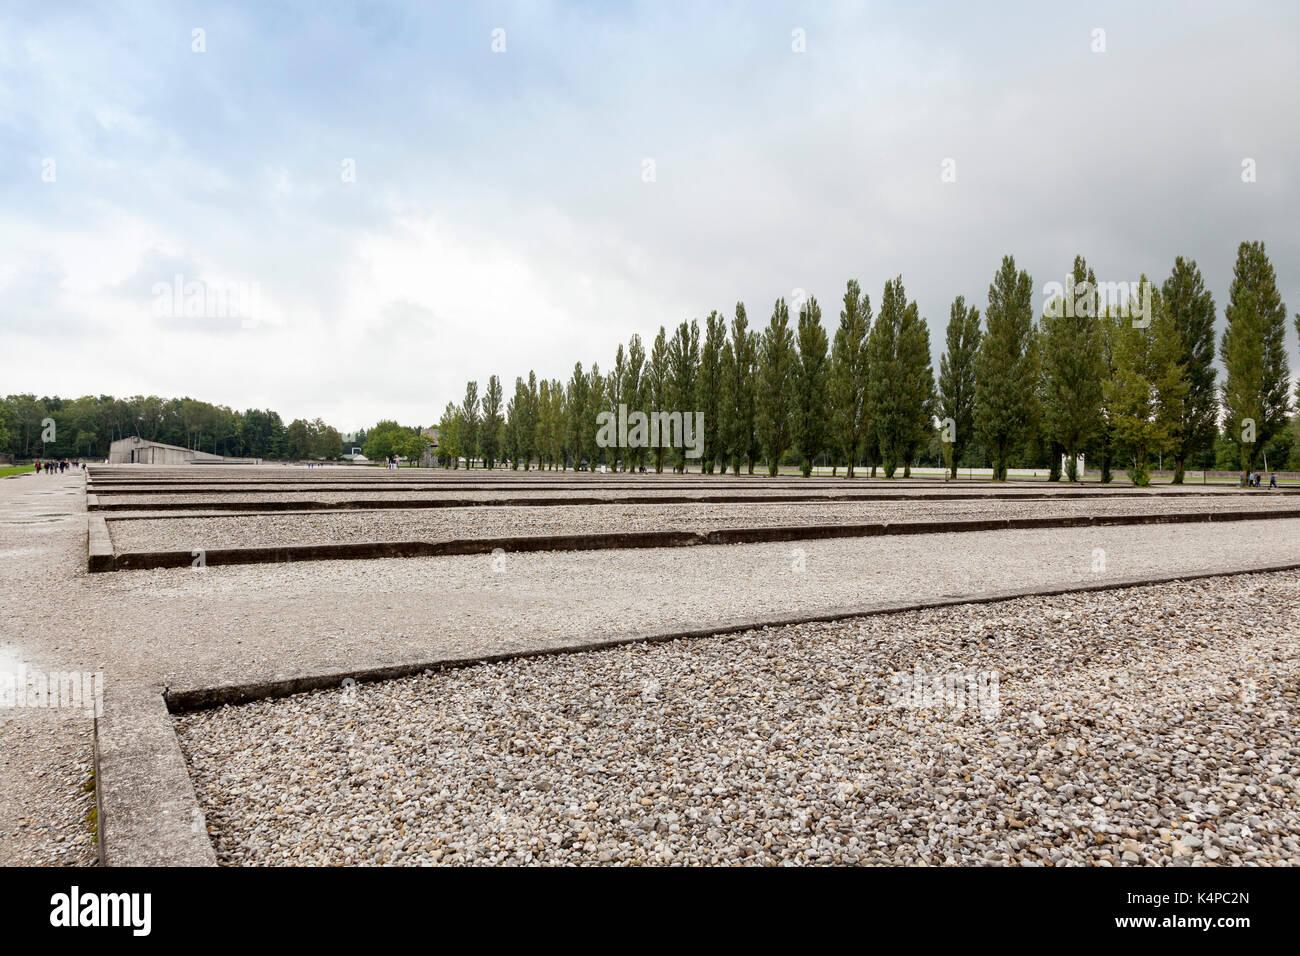 Dachau Concentration Camp Memorial Site - Stock Image